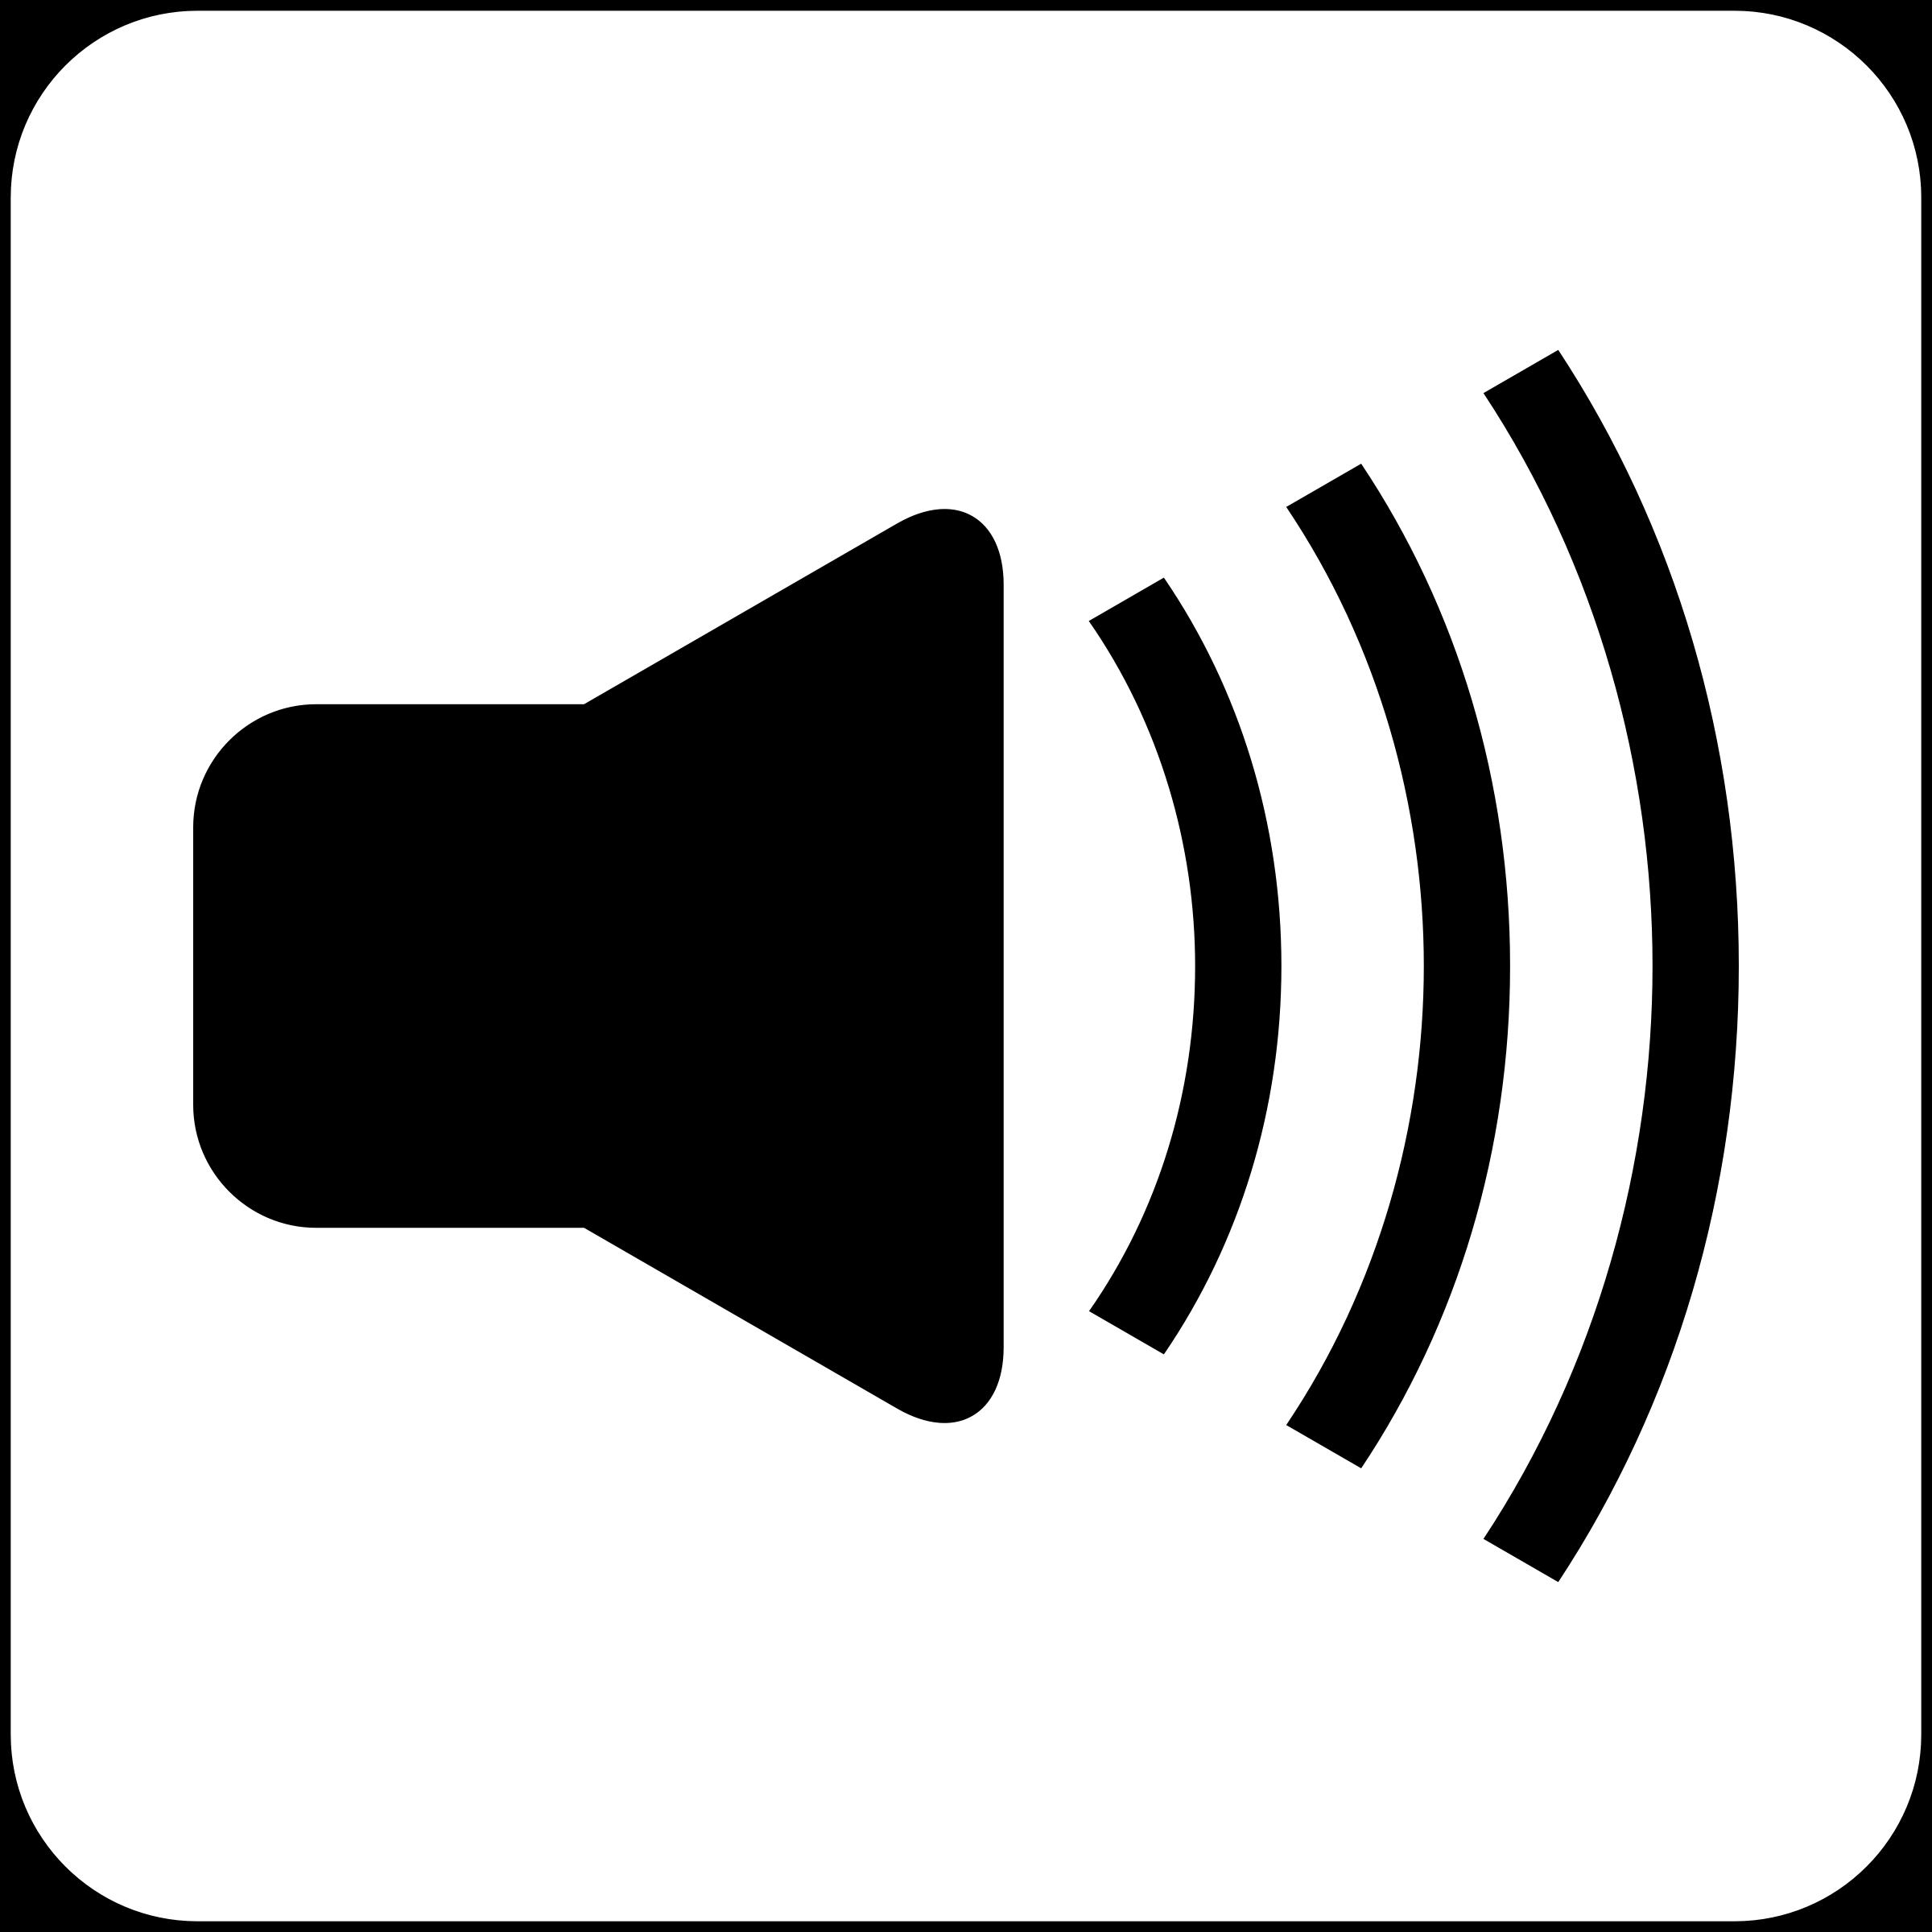 2400x2400 Sound Clip Art Many Interesting Cliparts